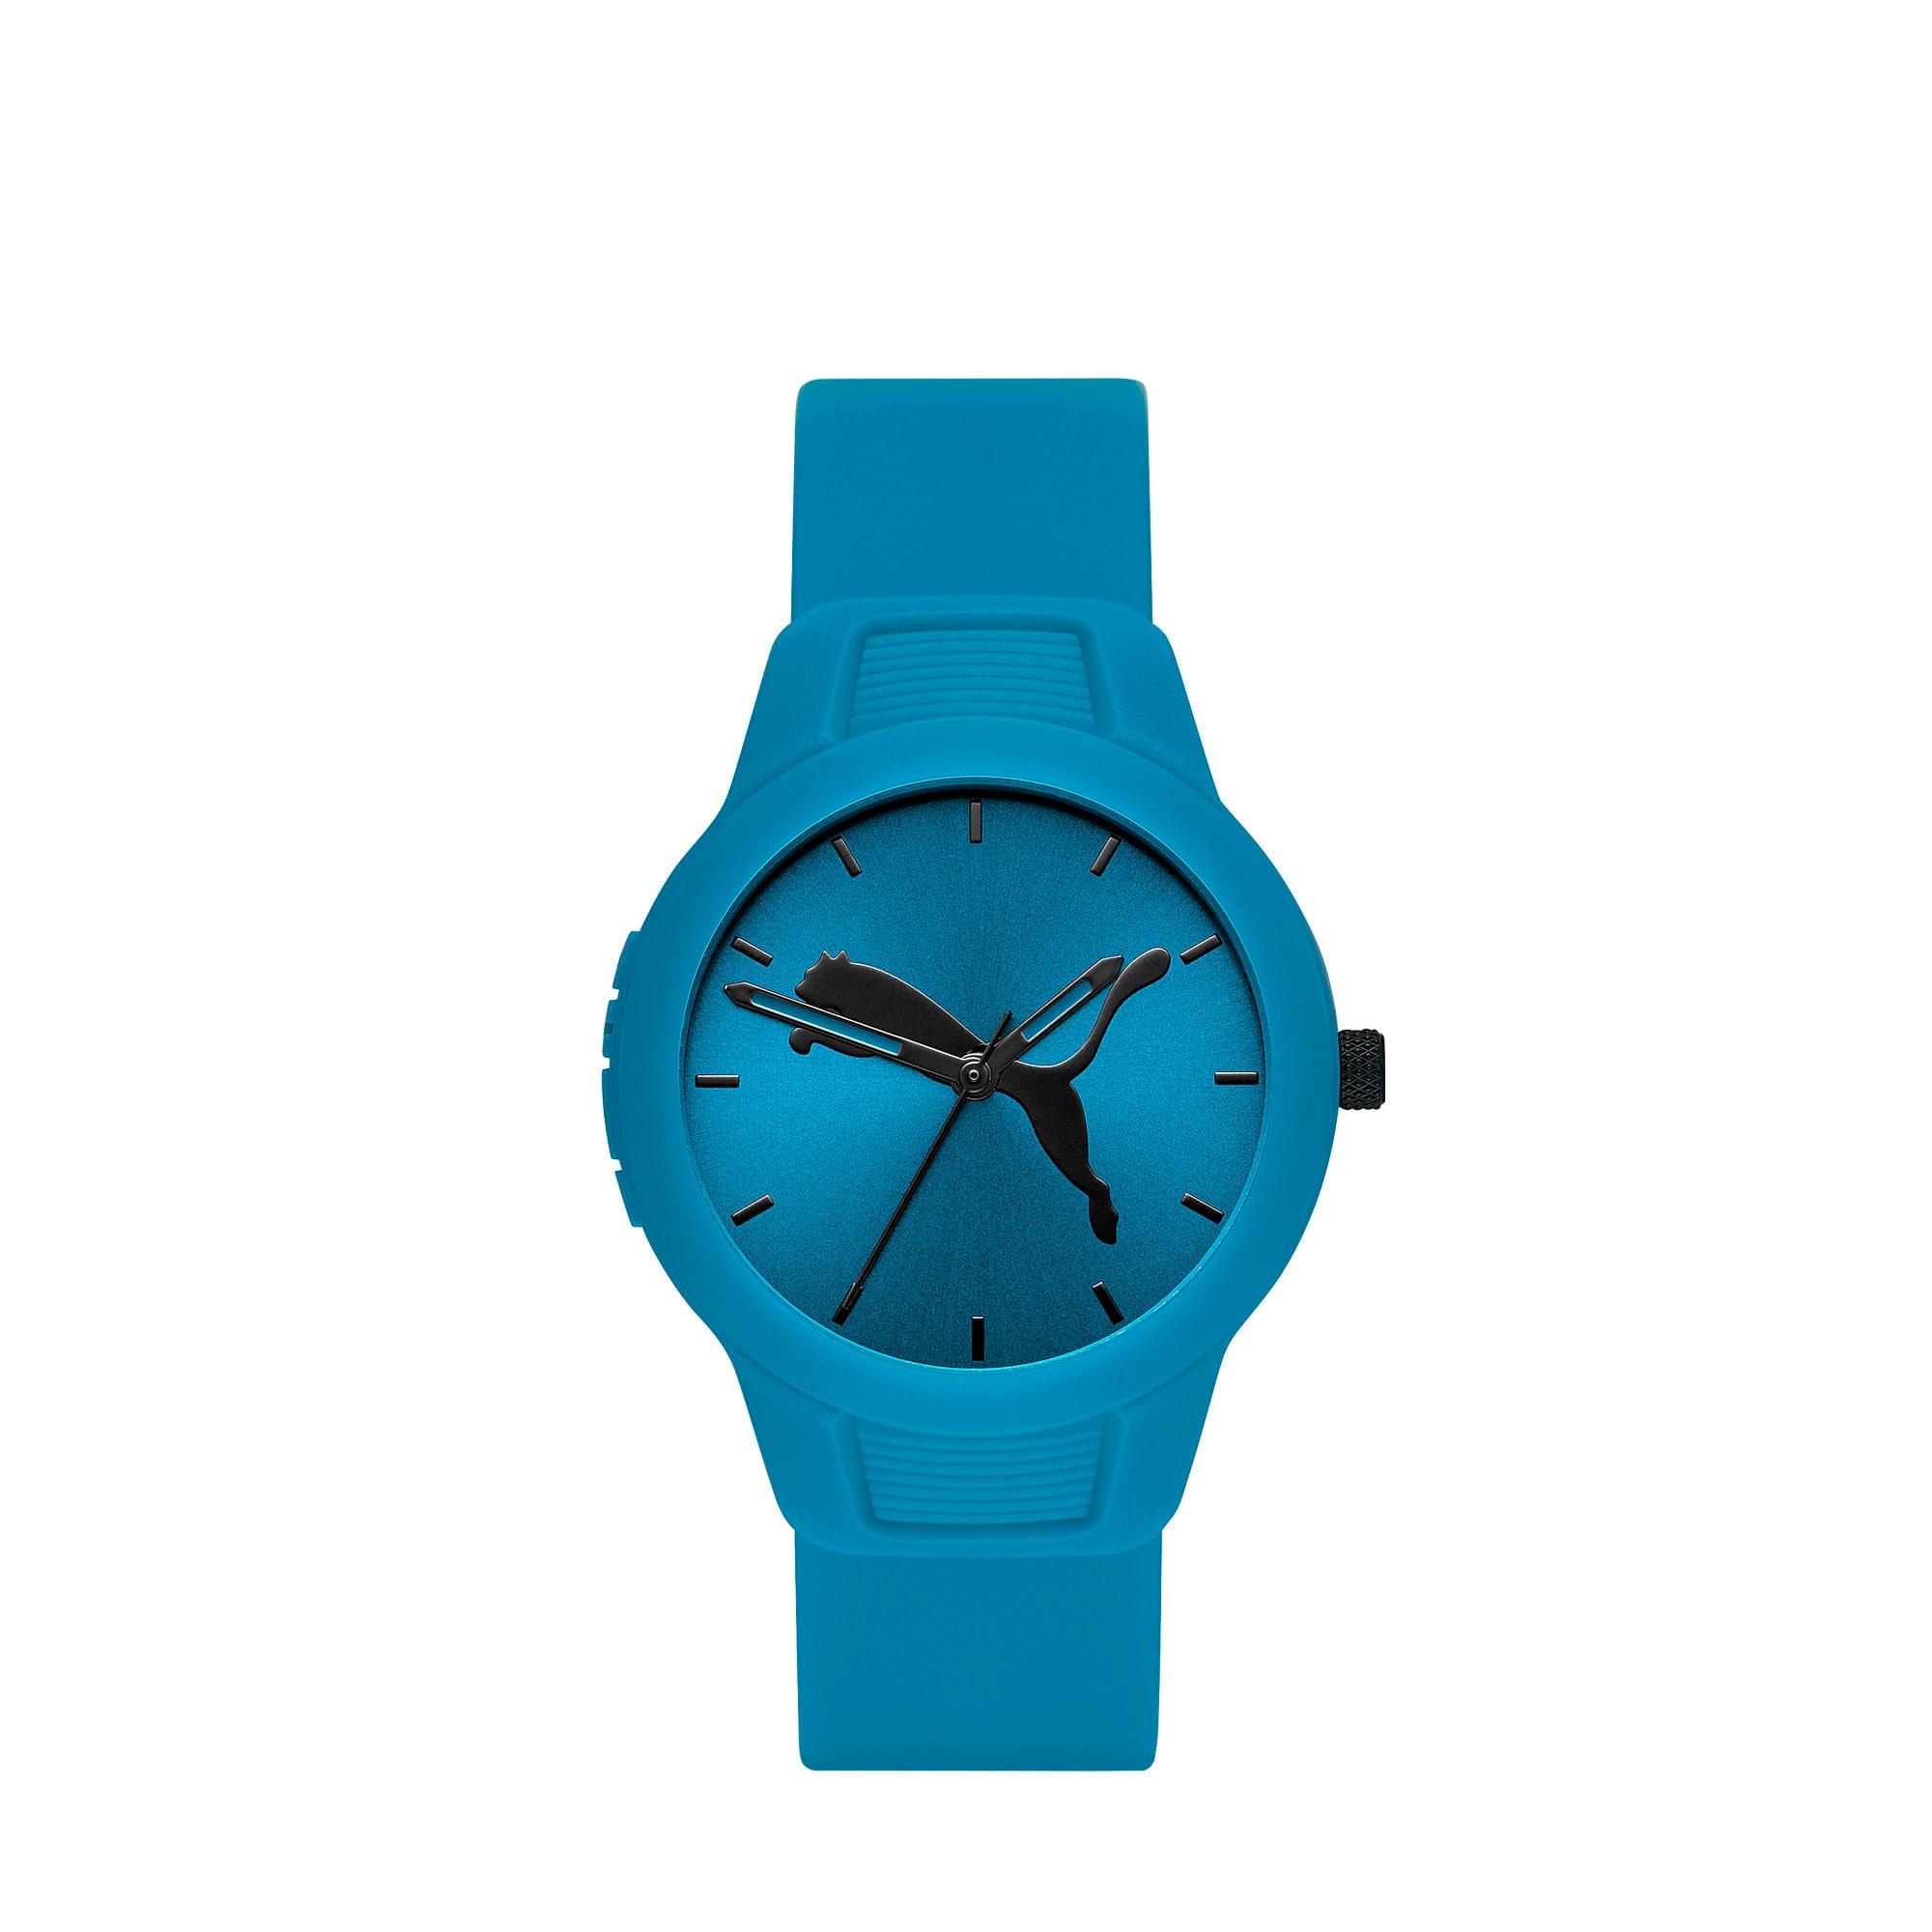 Thumbnail 1 of Reset Polyurethane V2 Women's Watch, Blue/Blue, medium